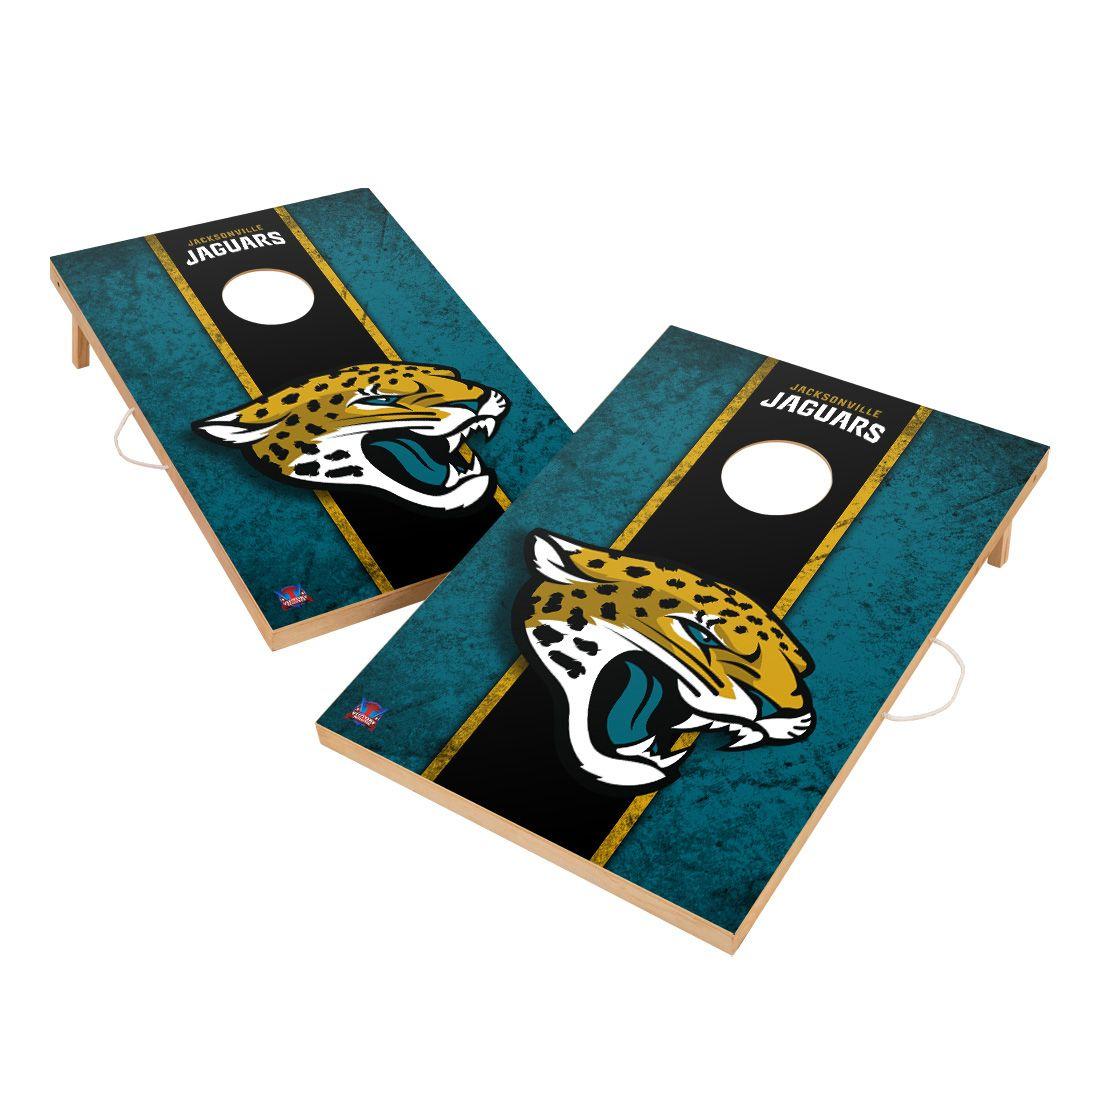 Vintage Jacksonville Jaguars NFL VT - Solid Wood 2x3 Cornhole